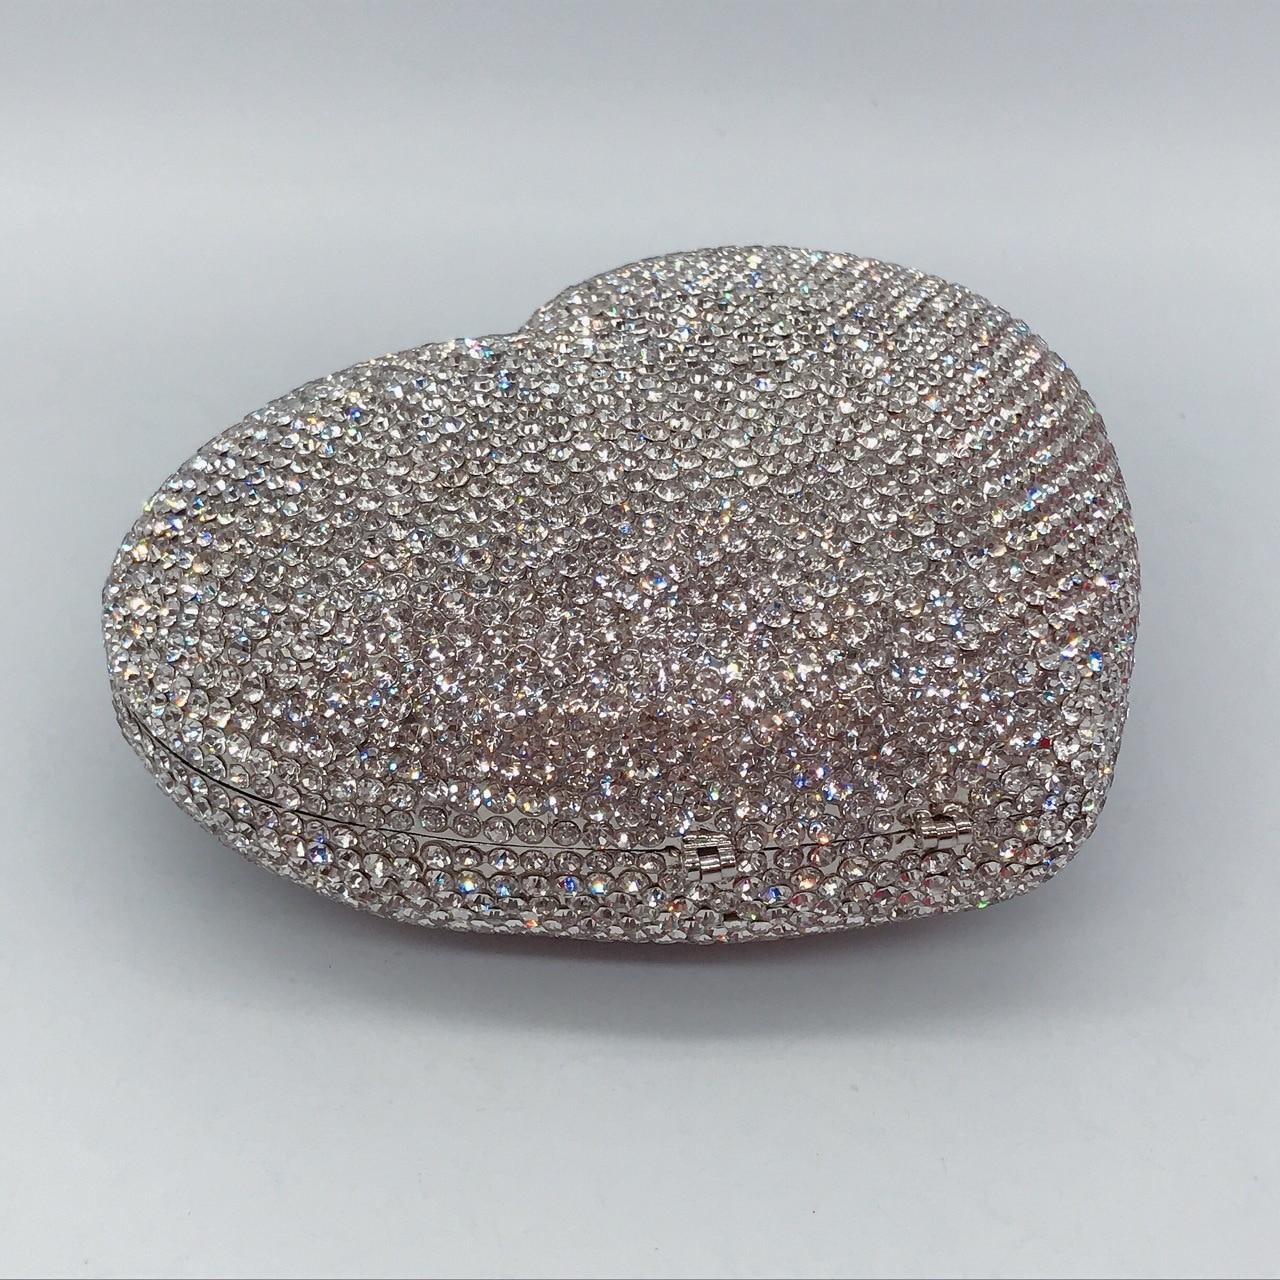 Bag For Women Red Heart Crystal Evening Clutch Bags Rhinestone Diamonds Bridal Handbag Wedding Party Women's Purse-BeeInFly